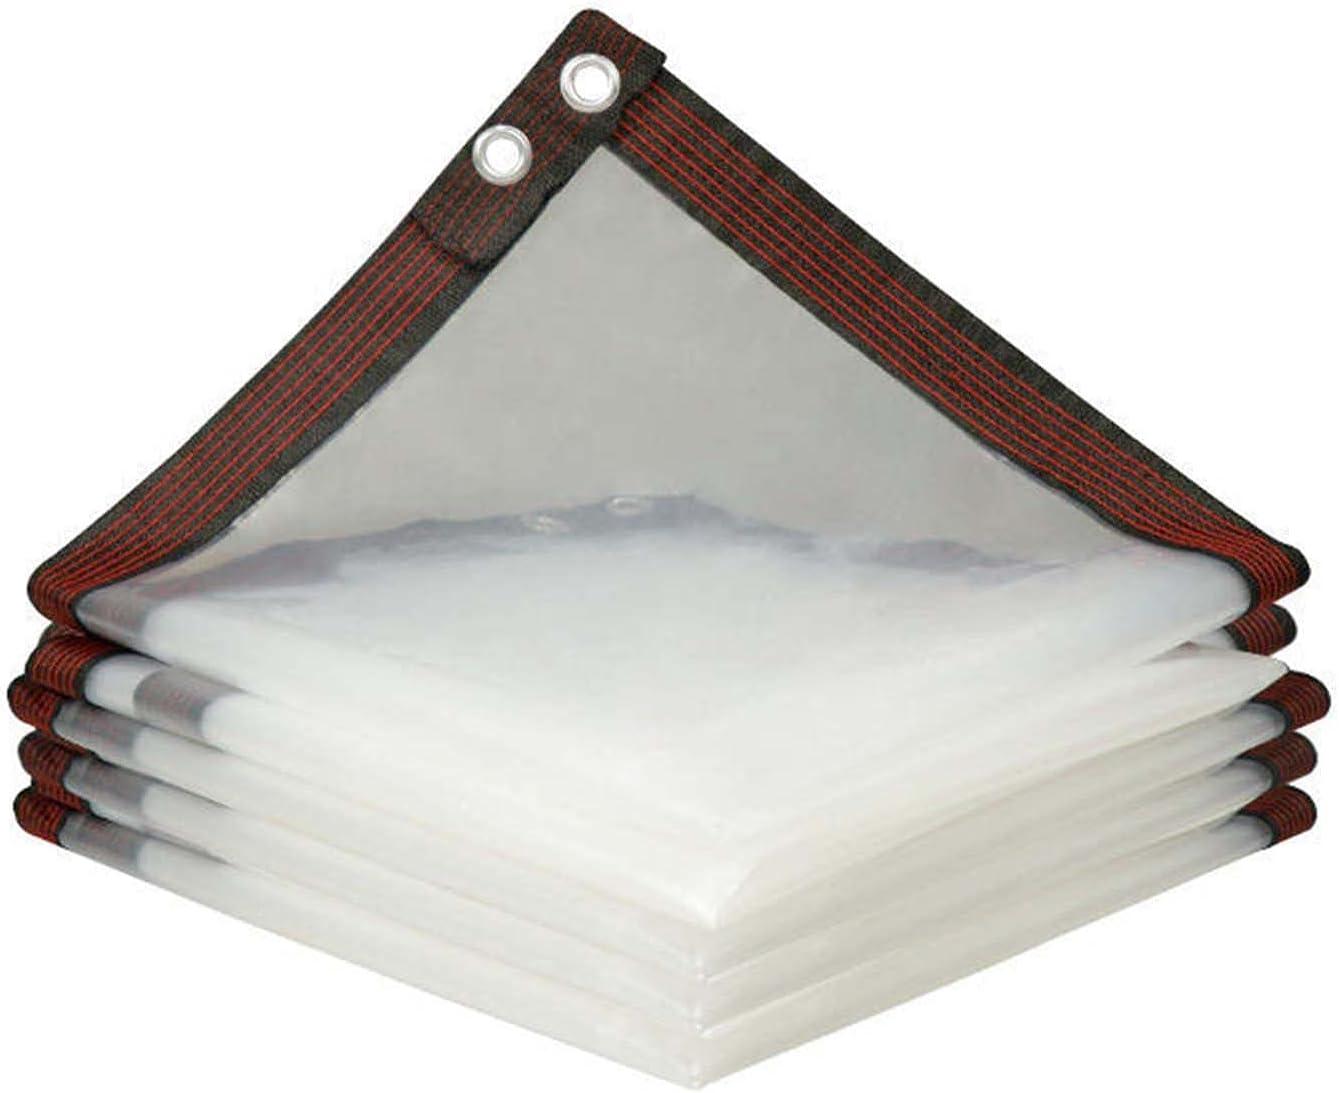 JLXJ Our shop OFFers the best service tarp Waterproof Tarps with supreme Metal Transparent Tarp Grommets